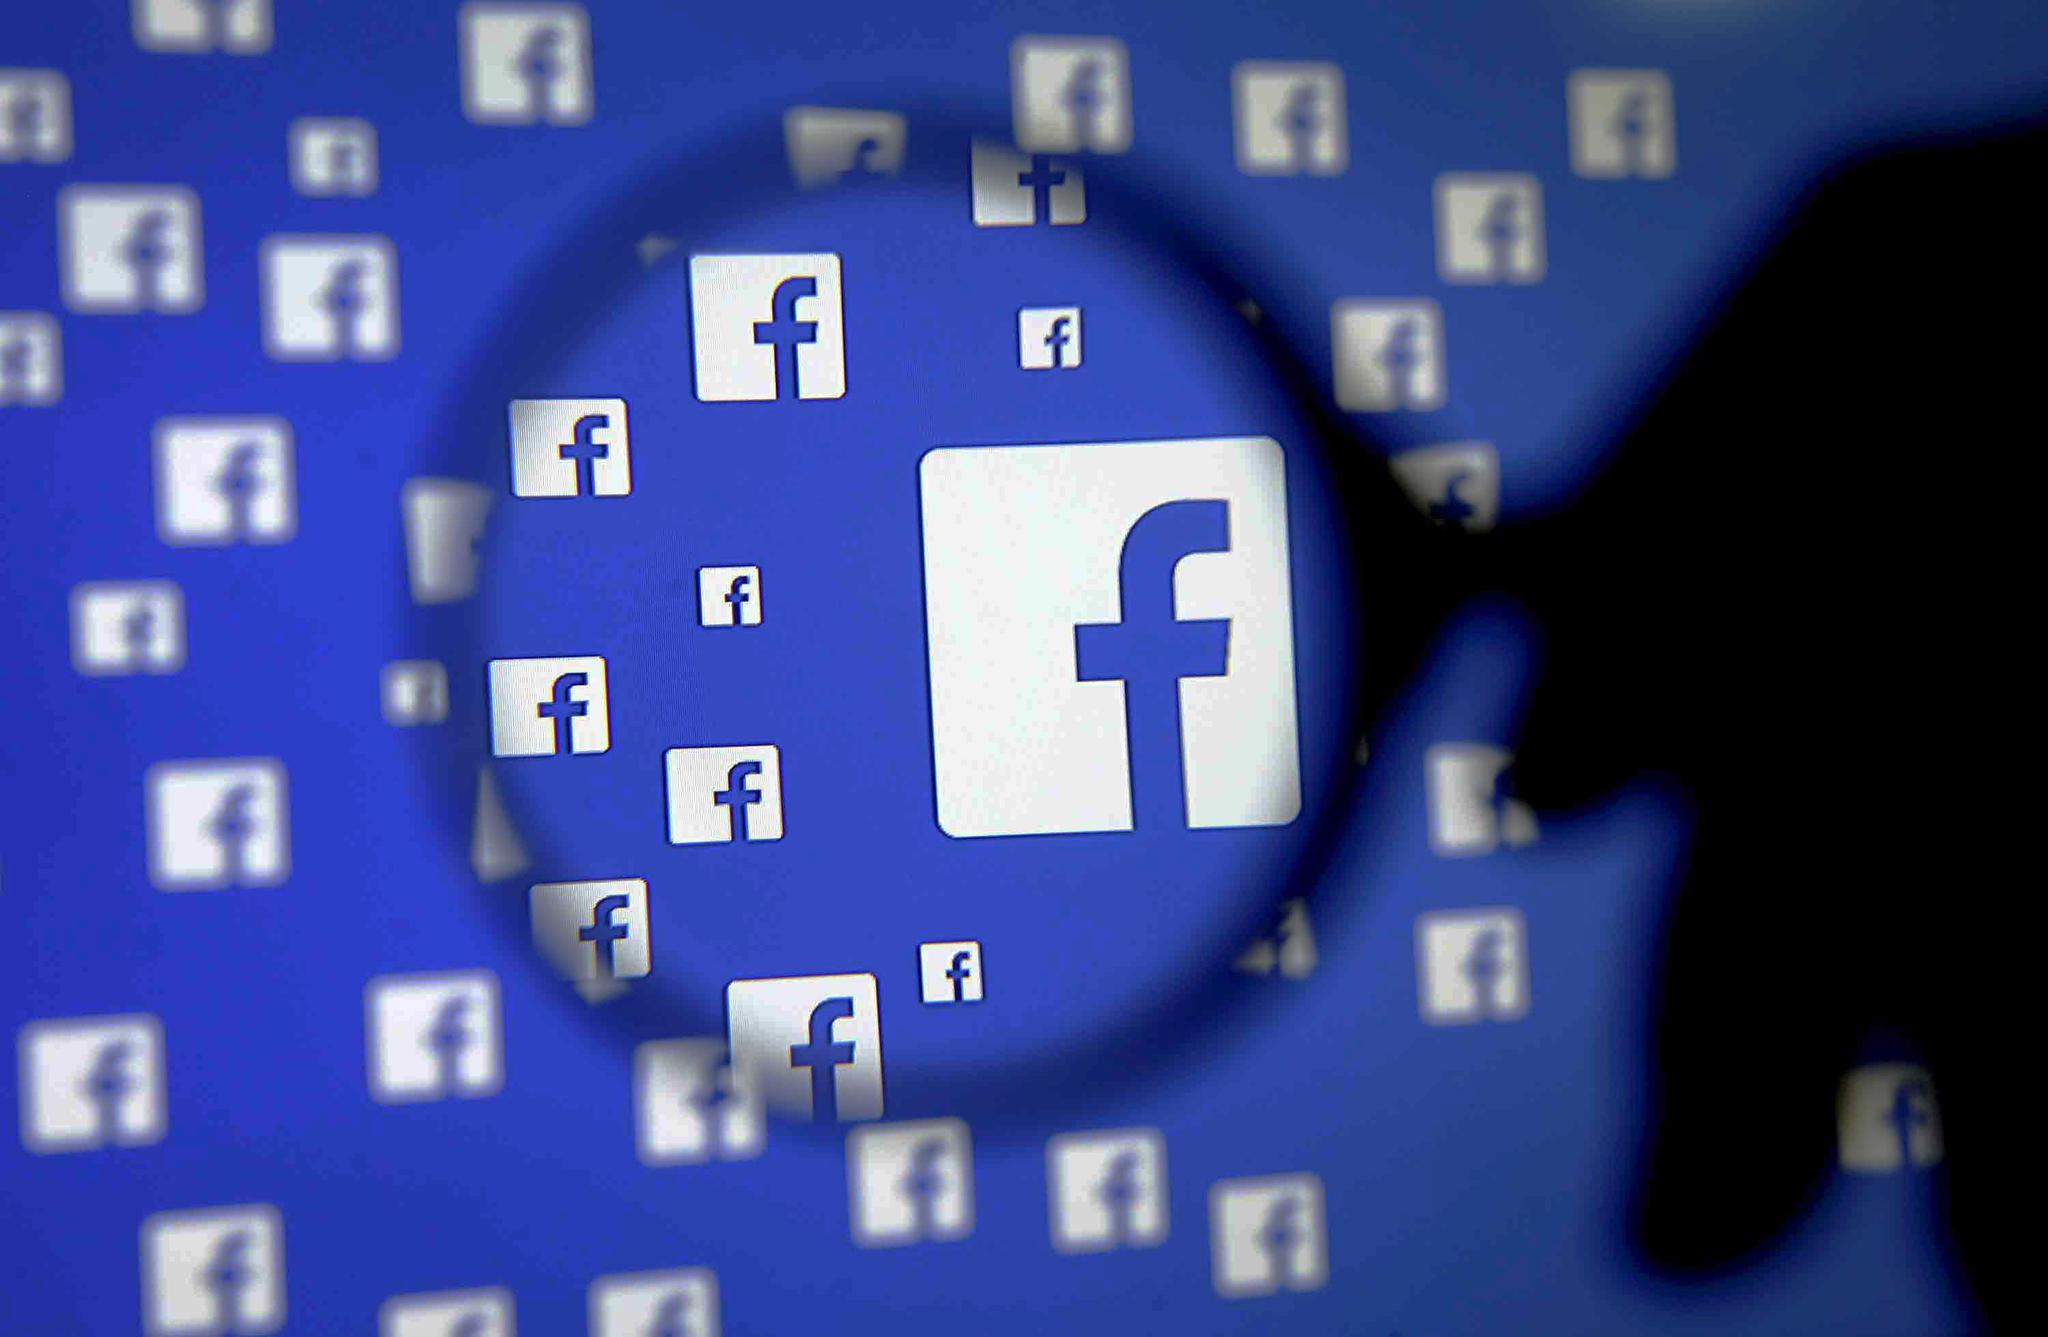 Facebook正调查数据滥用问题 但难以追踪数据去向